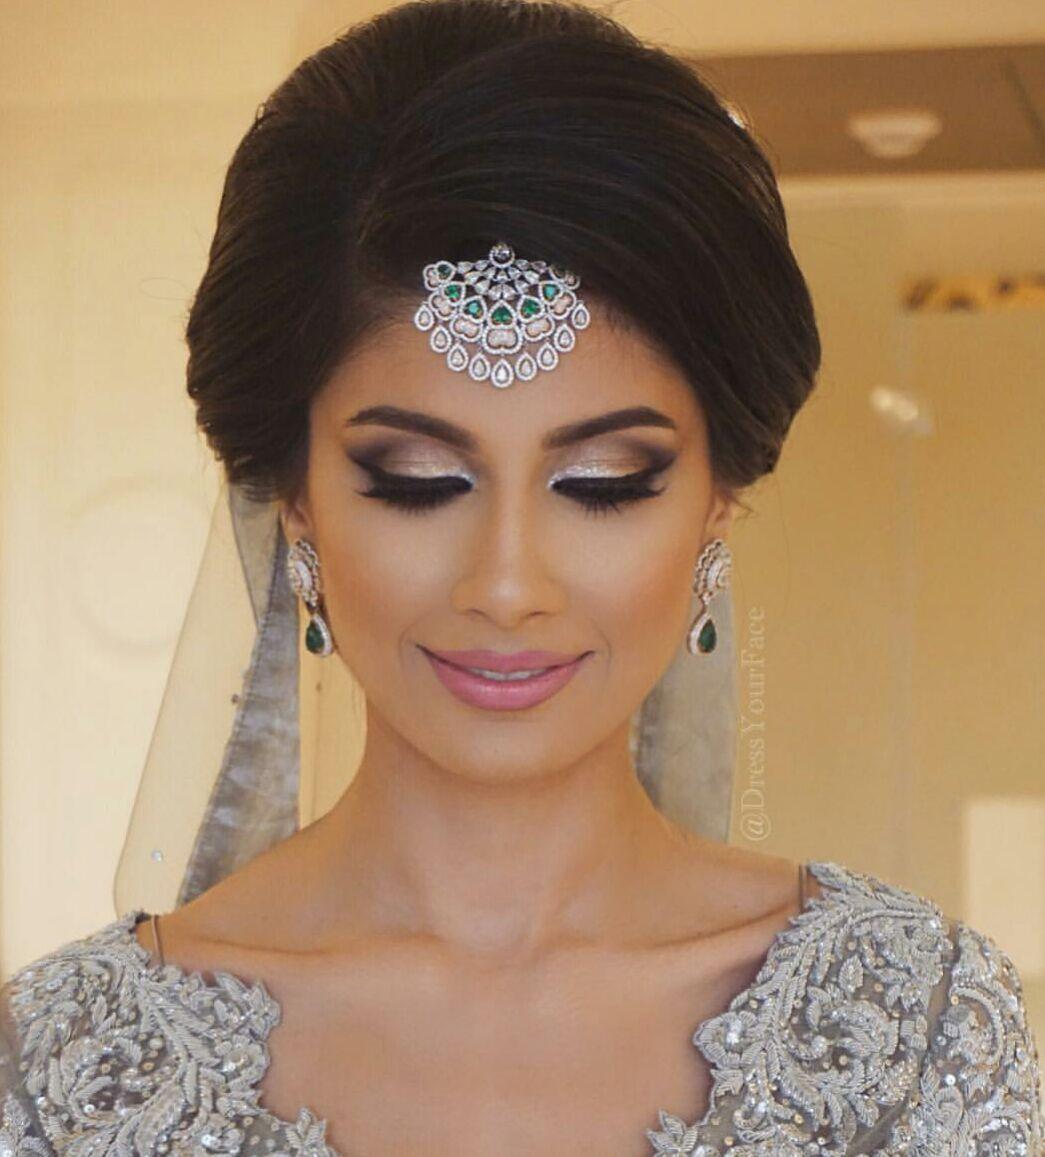 Indian Wedding   Dress Your Face   Tamanna Roashan   Roshini Daswani   Bridal Hair and Make up   Bridal Look   Indian Bride   Kamyen Jewellery   Abu Dhabi   Elan